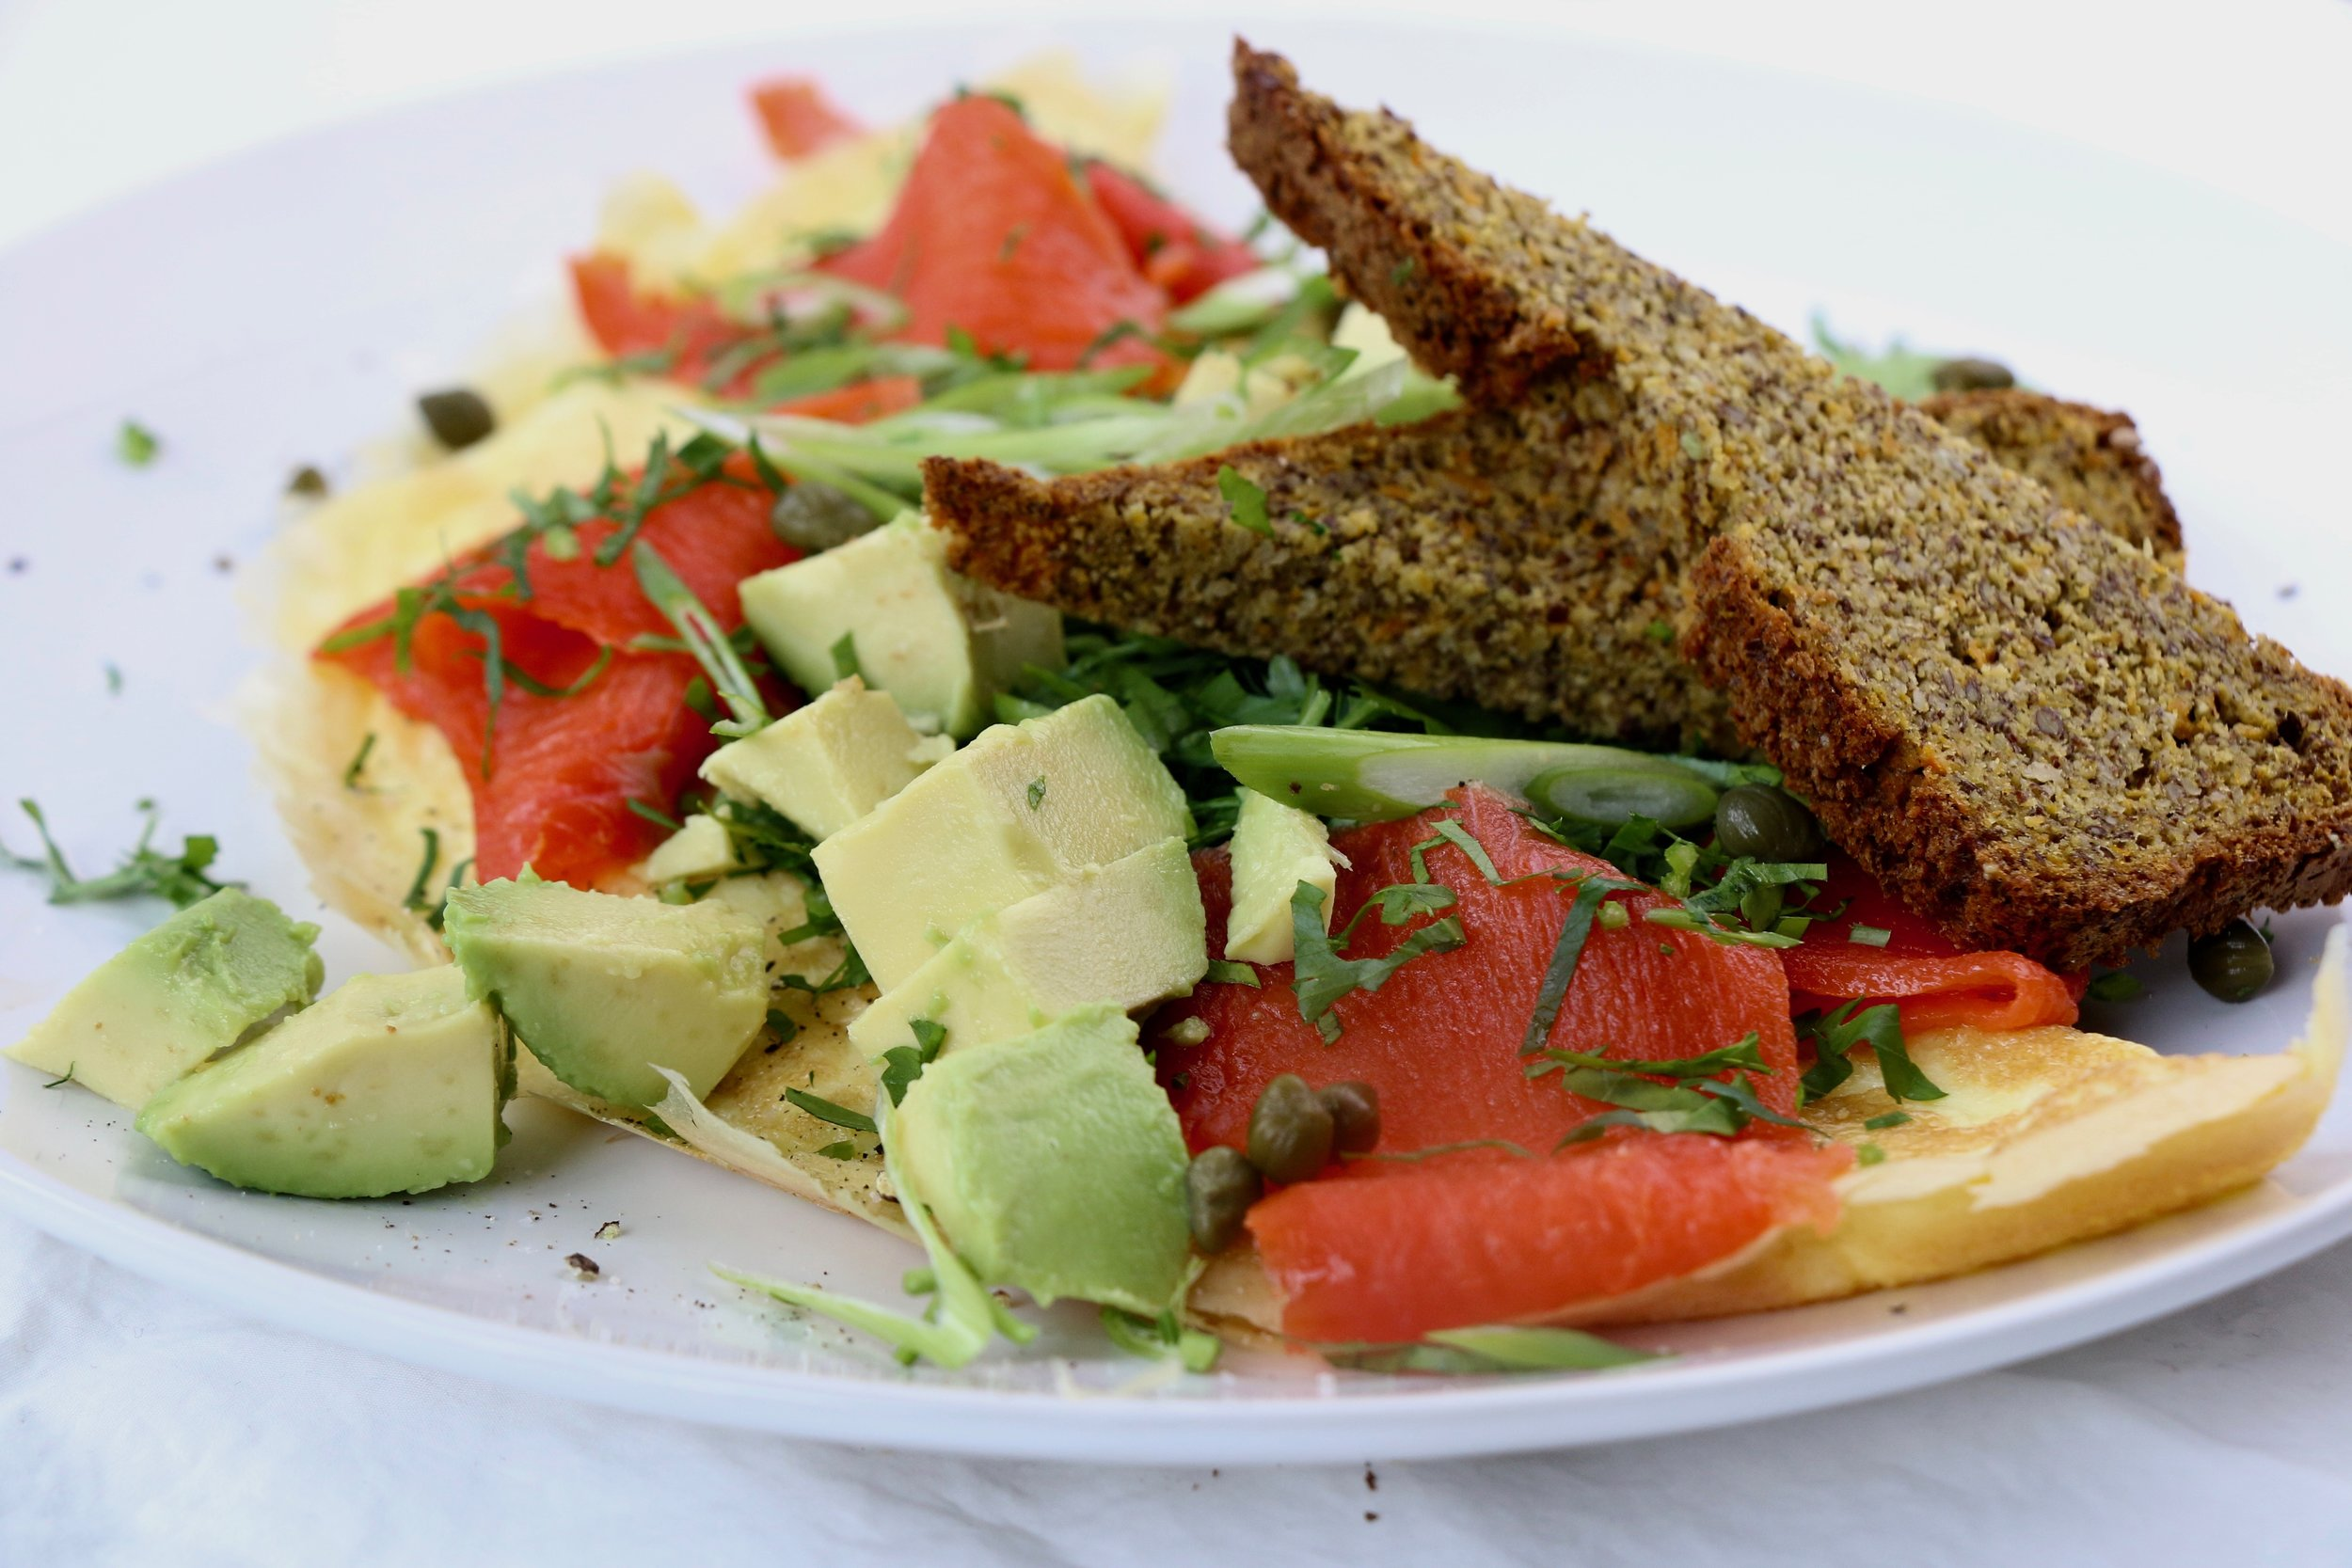 Salmon omelette - with Sweet potato protein bread